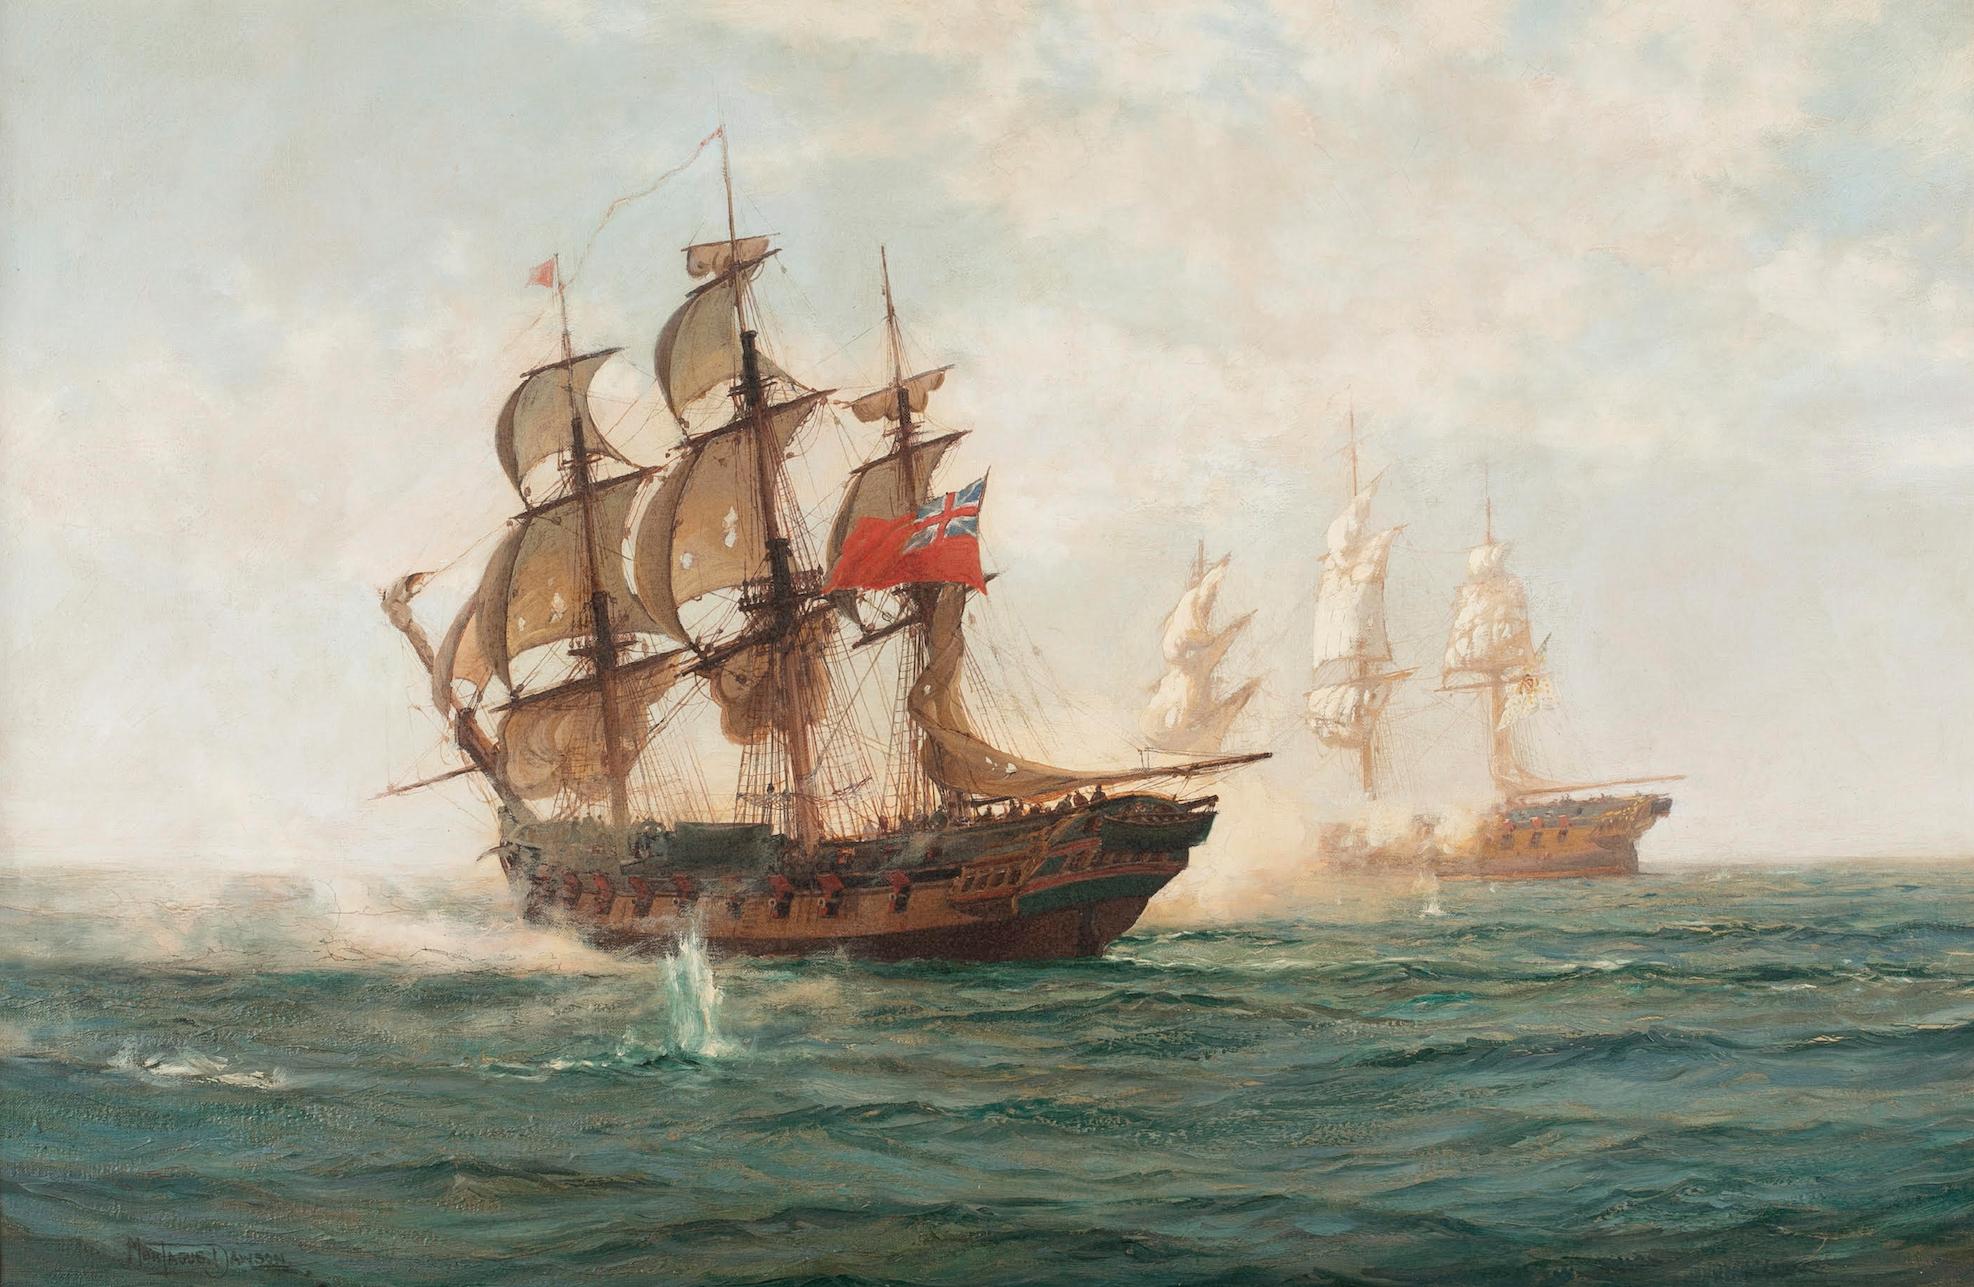 Montague Dawson marine painting is flagship of Quinn's Jan. 26 auction